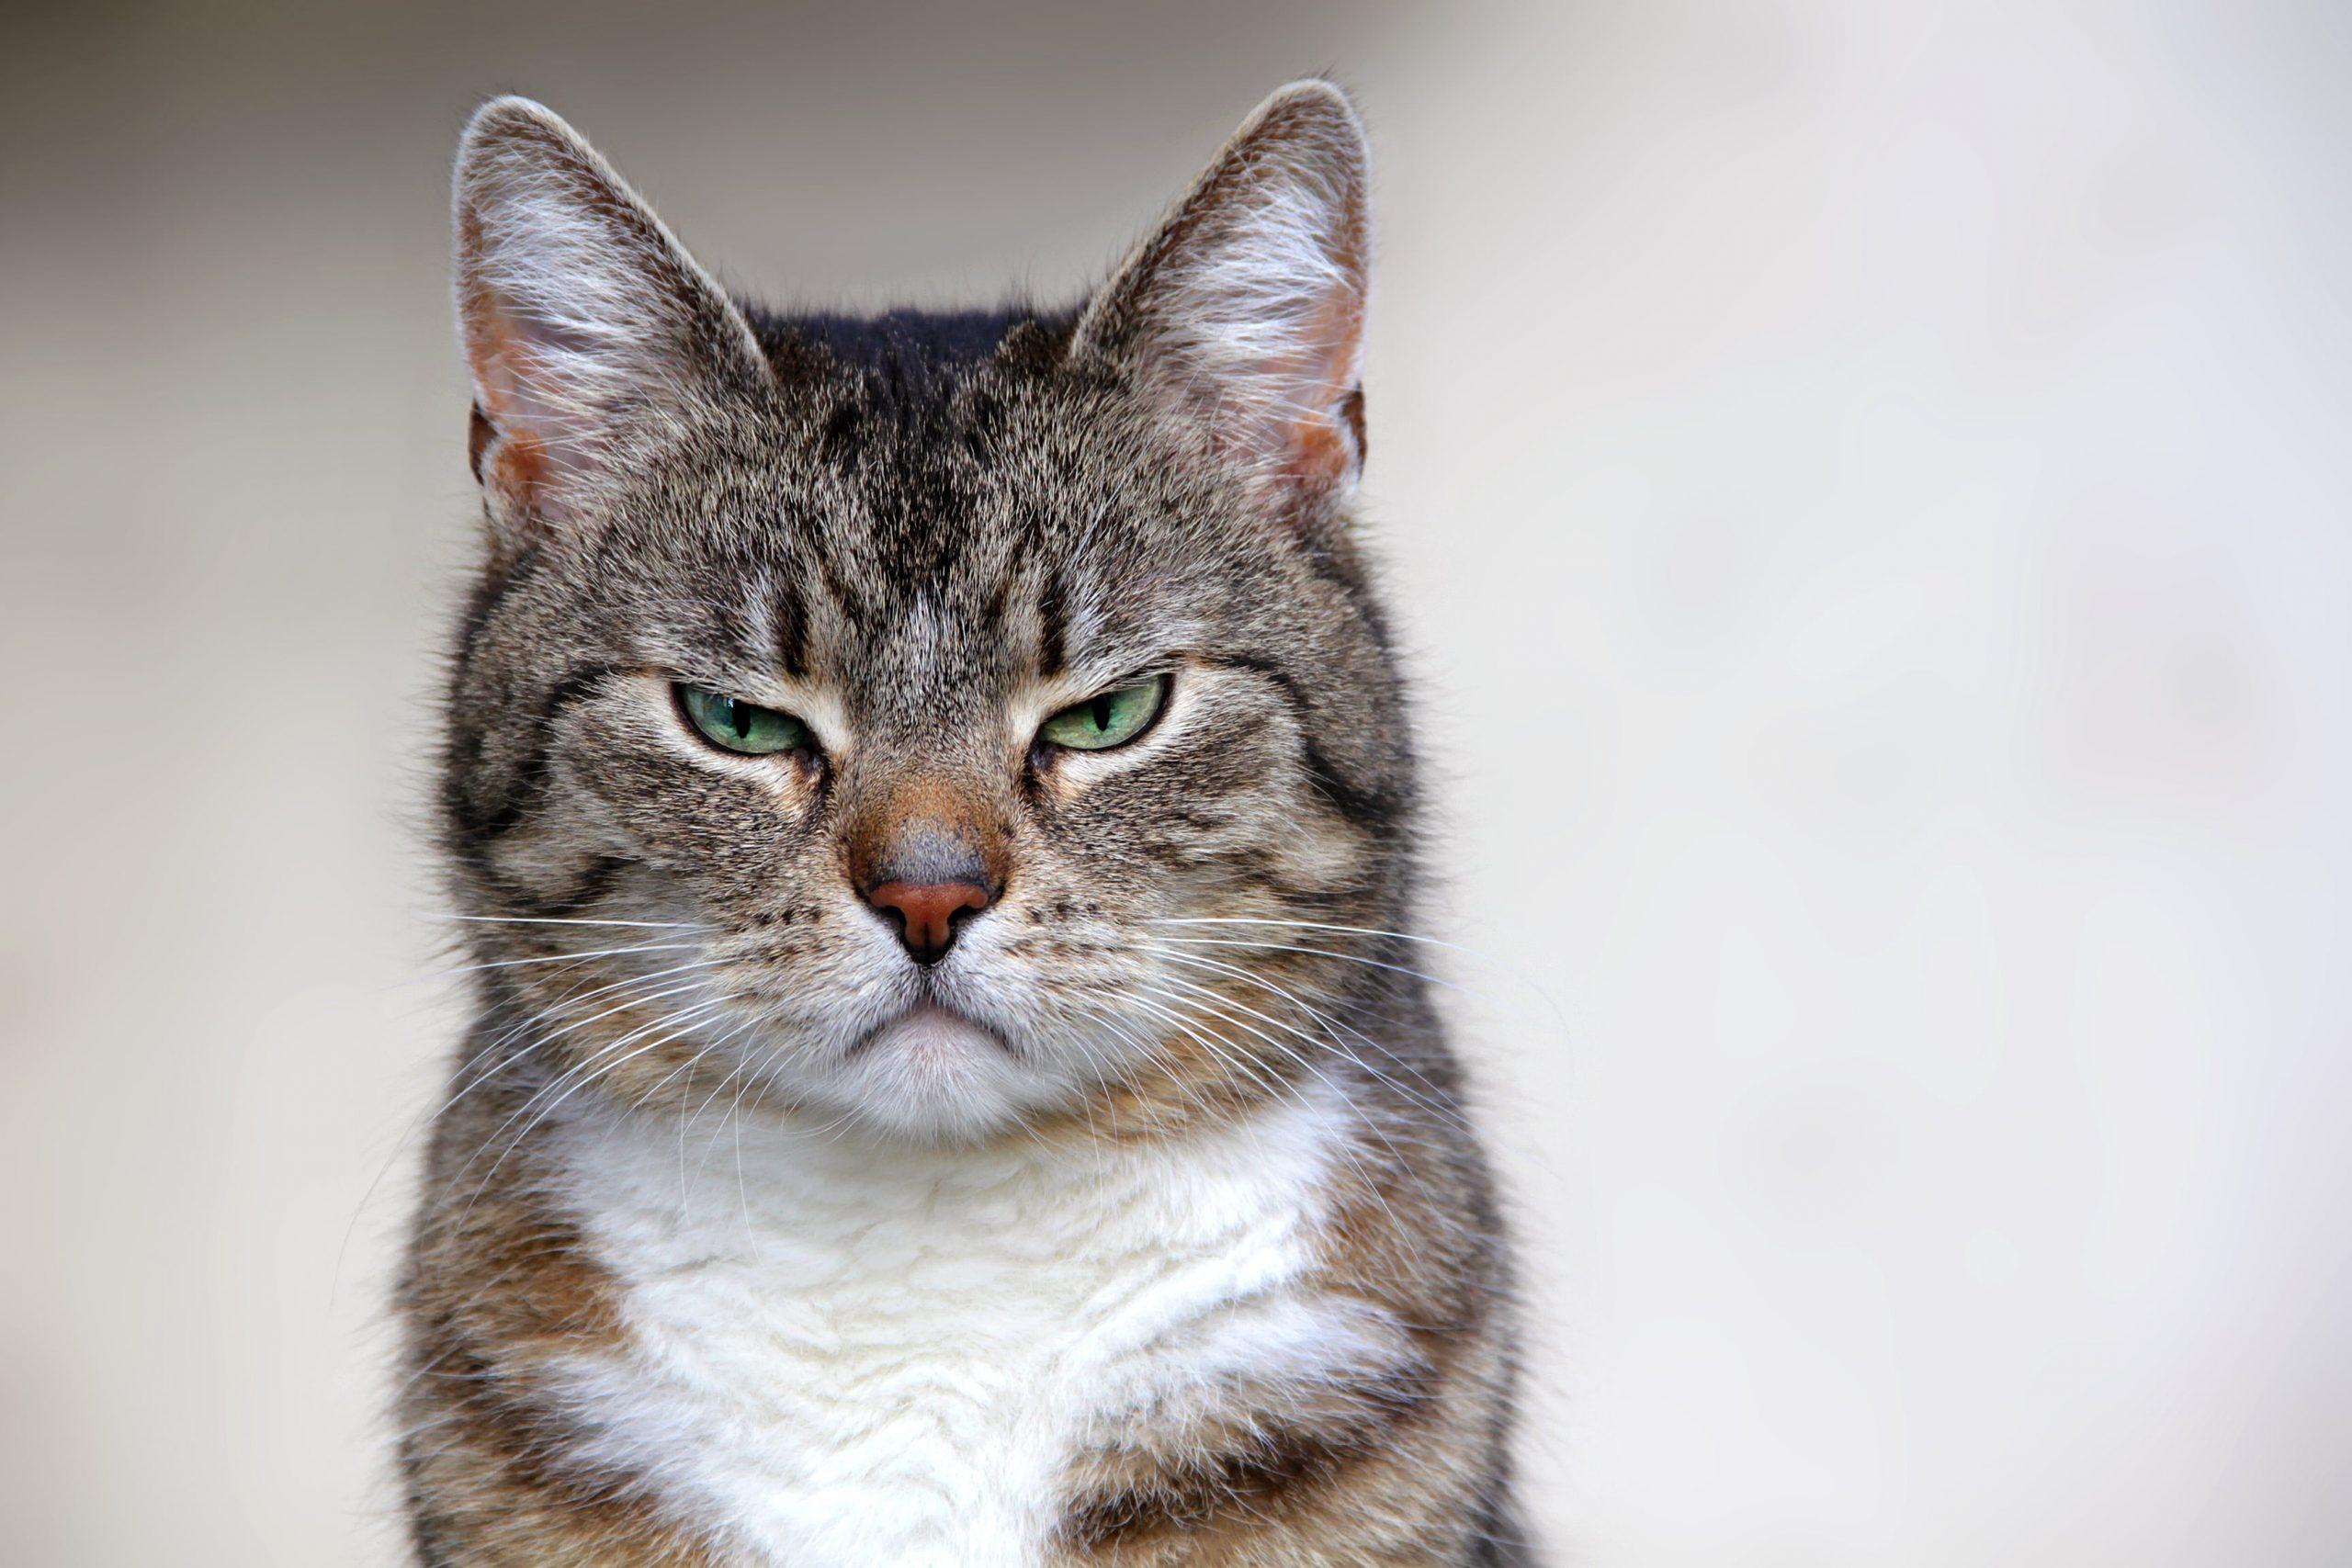 Gatos en cuarentena: Consejos para evitar estrés en tu mascota